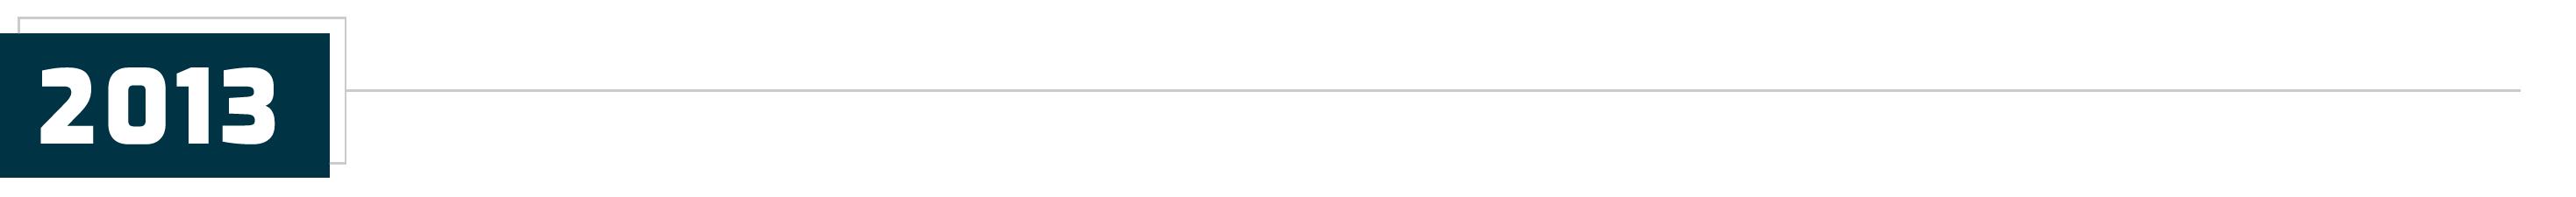 Choice Bank Timeline 2013